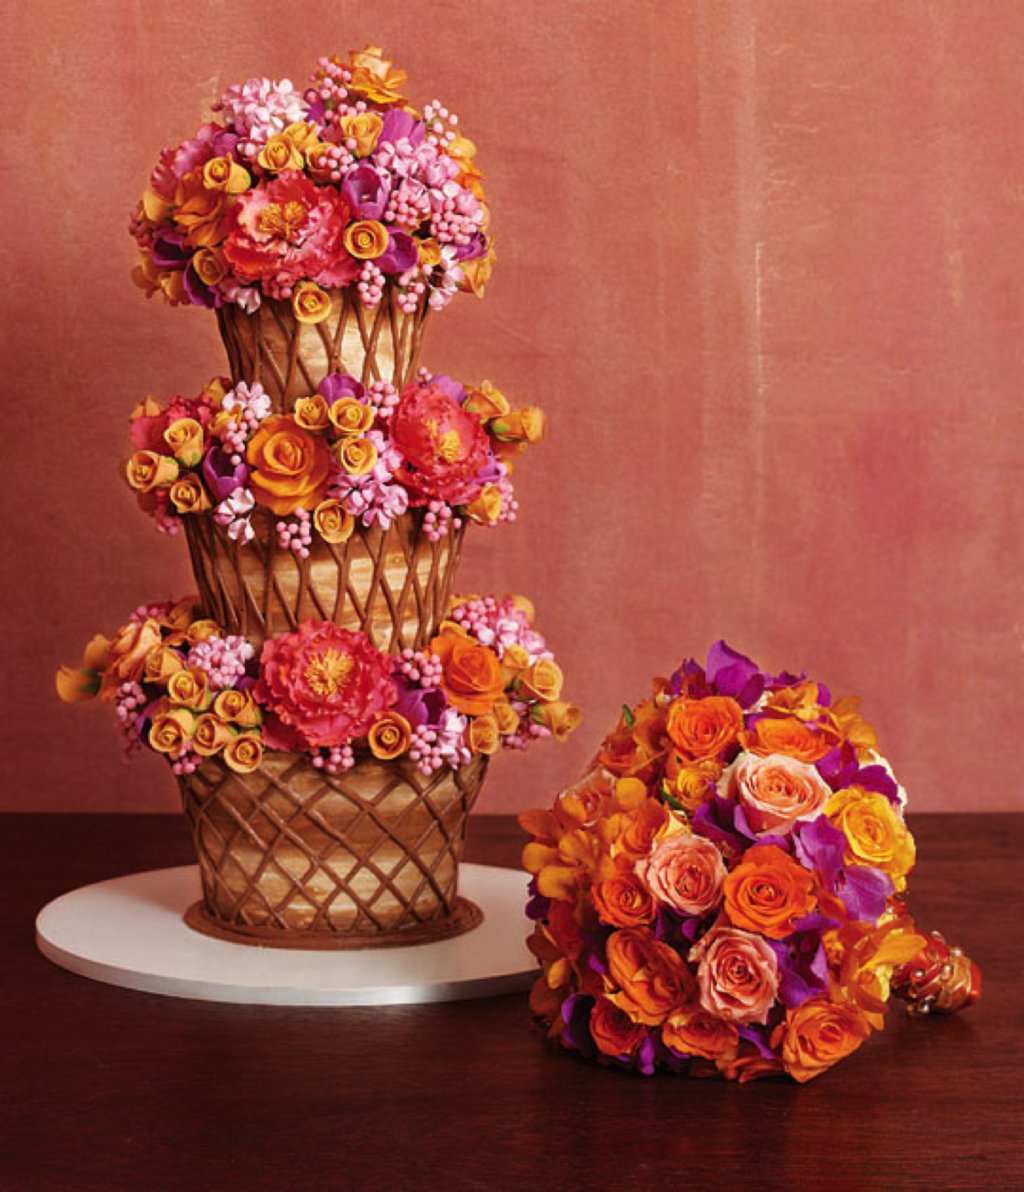 Sylvia-weinstock-wedding-cakes-wedding-planners-event-design-preston-bailey-new-york-wedding.full